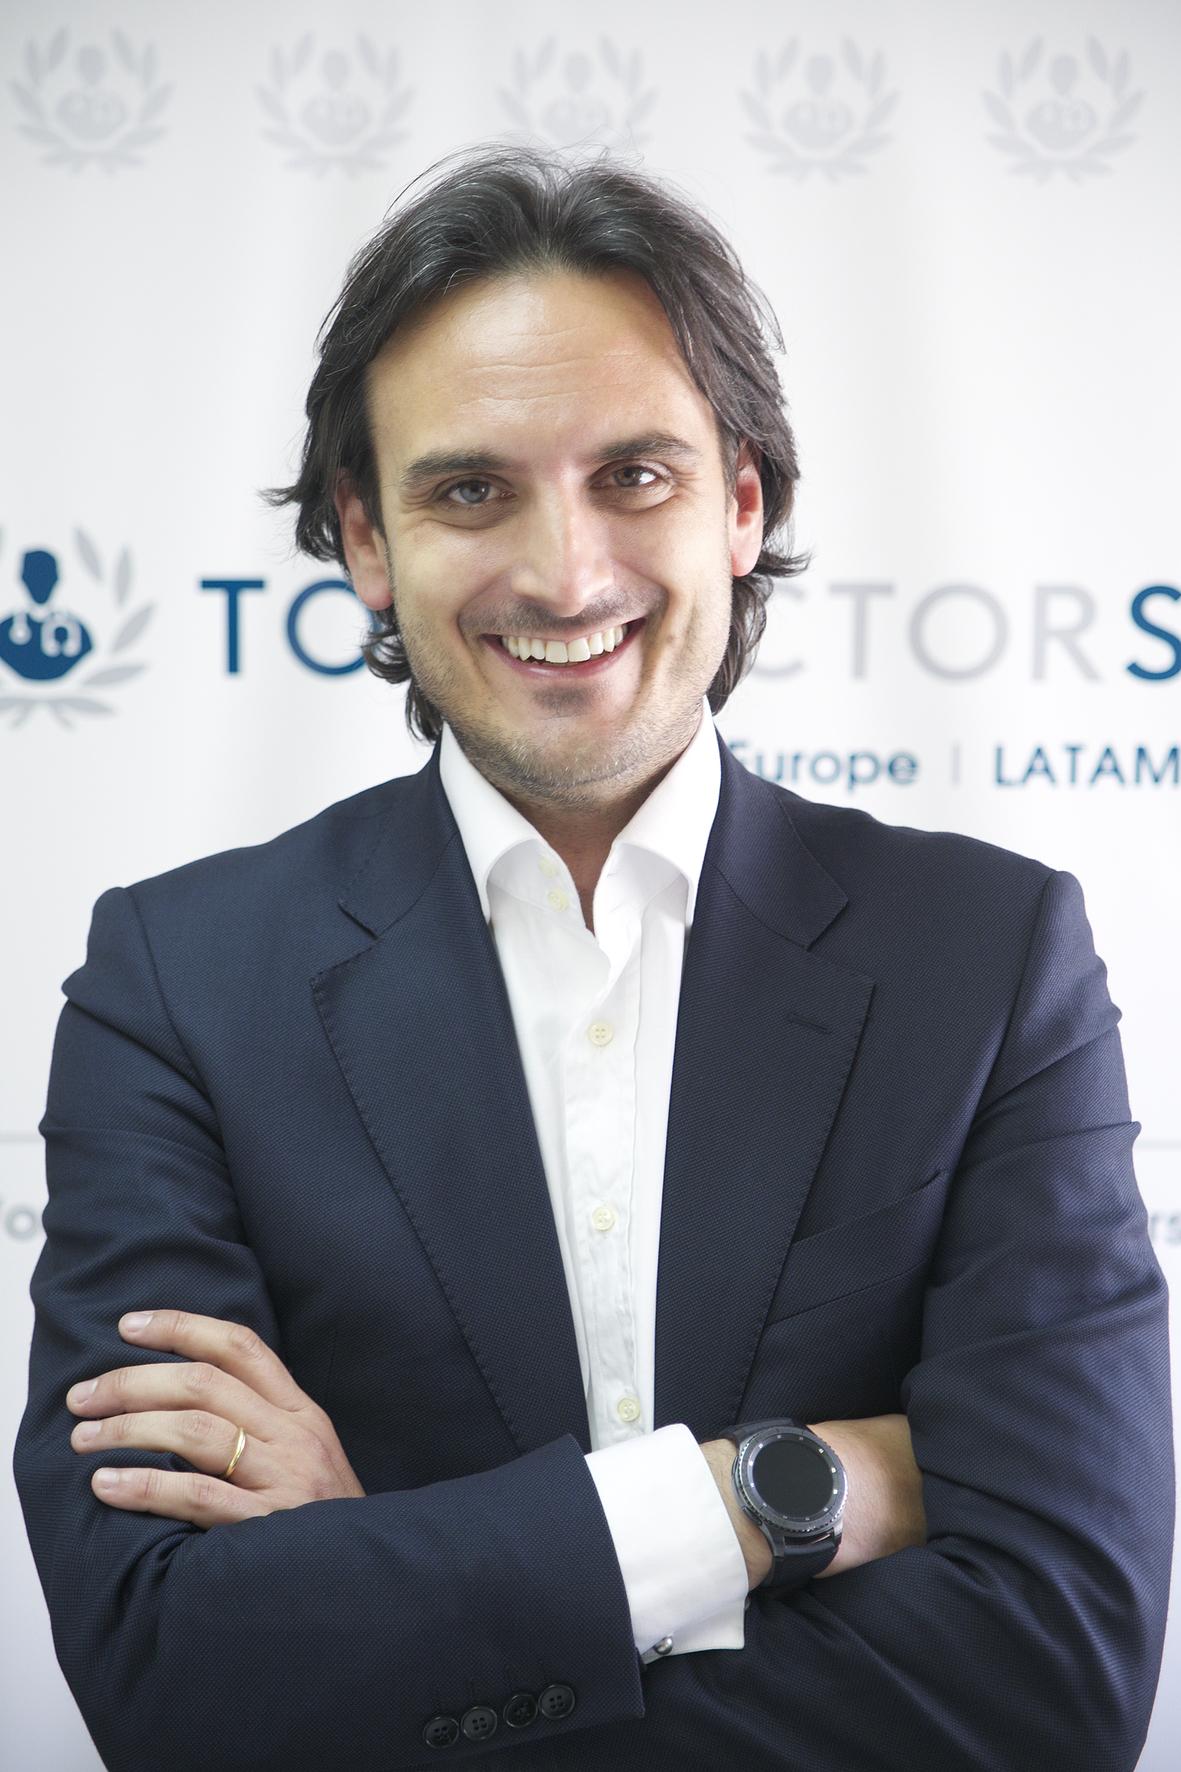 Alberto Porciani, TopDoctors